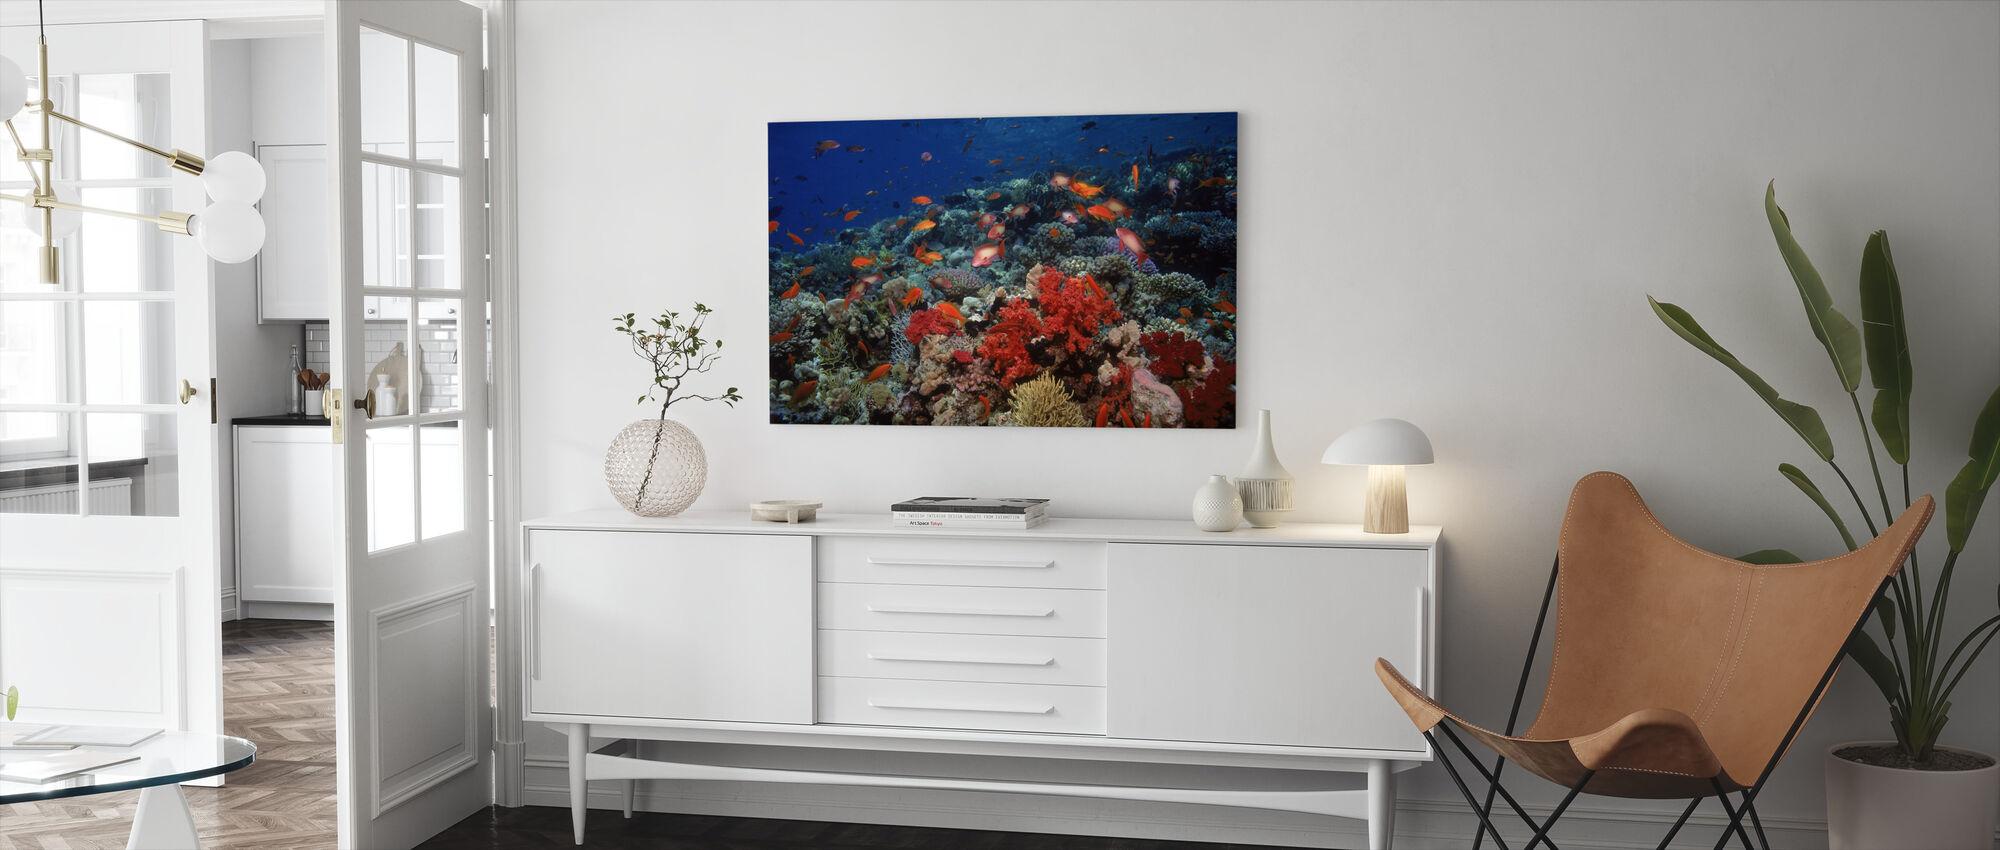 Rødehavet - Lerretsbilde - Stue